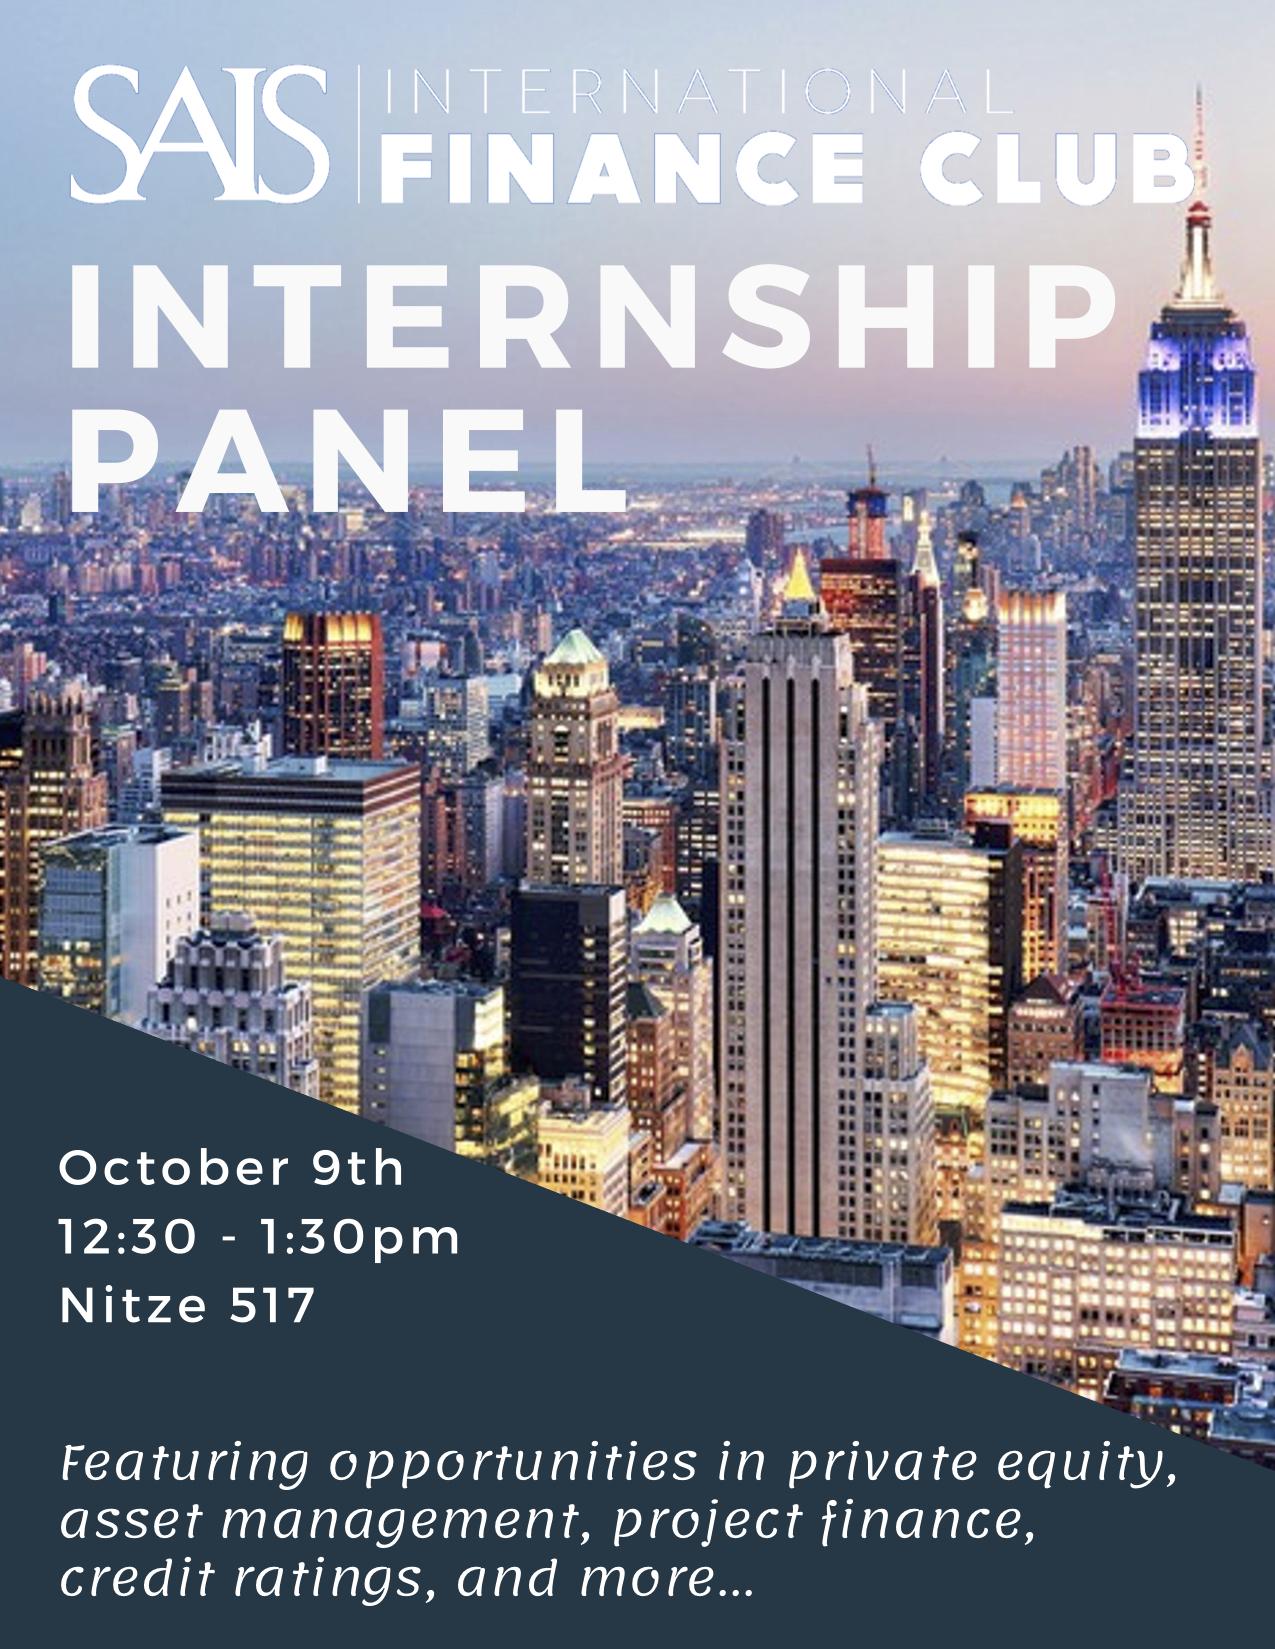 SIFC internship panel